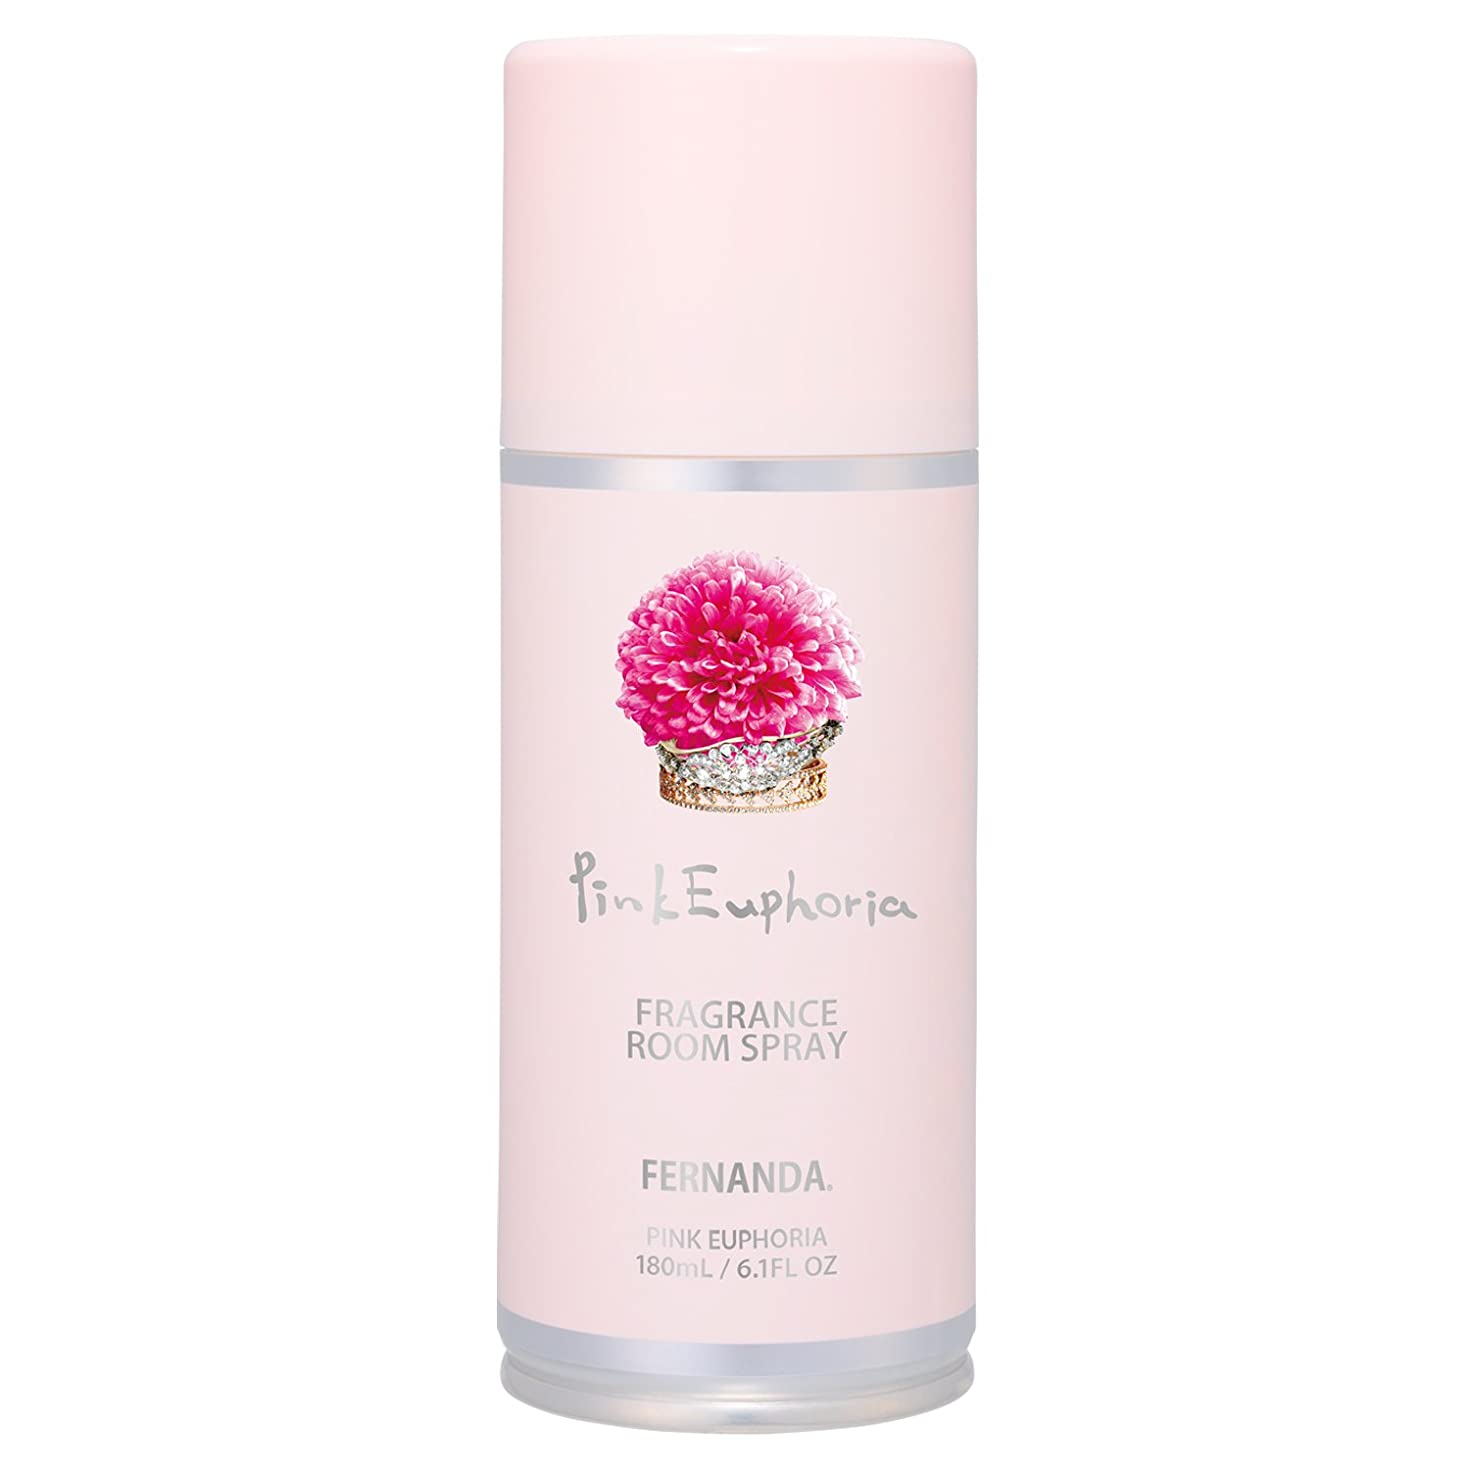 FERNANDA(フェルナンダ) Room Spray Pink Euphoria(ルームスプレー ピンクエウフォリア)